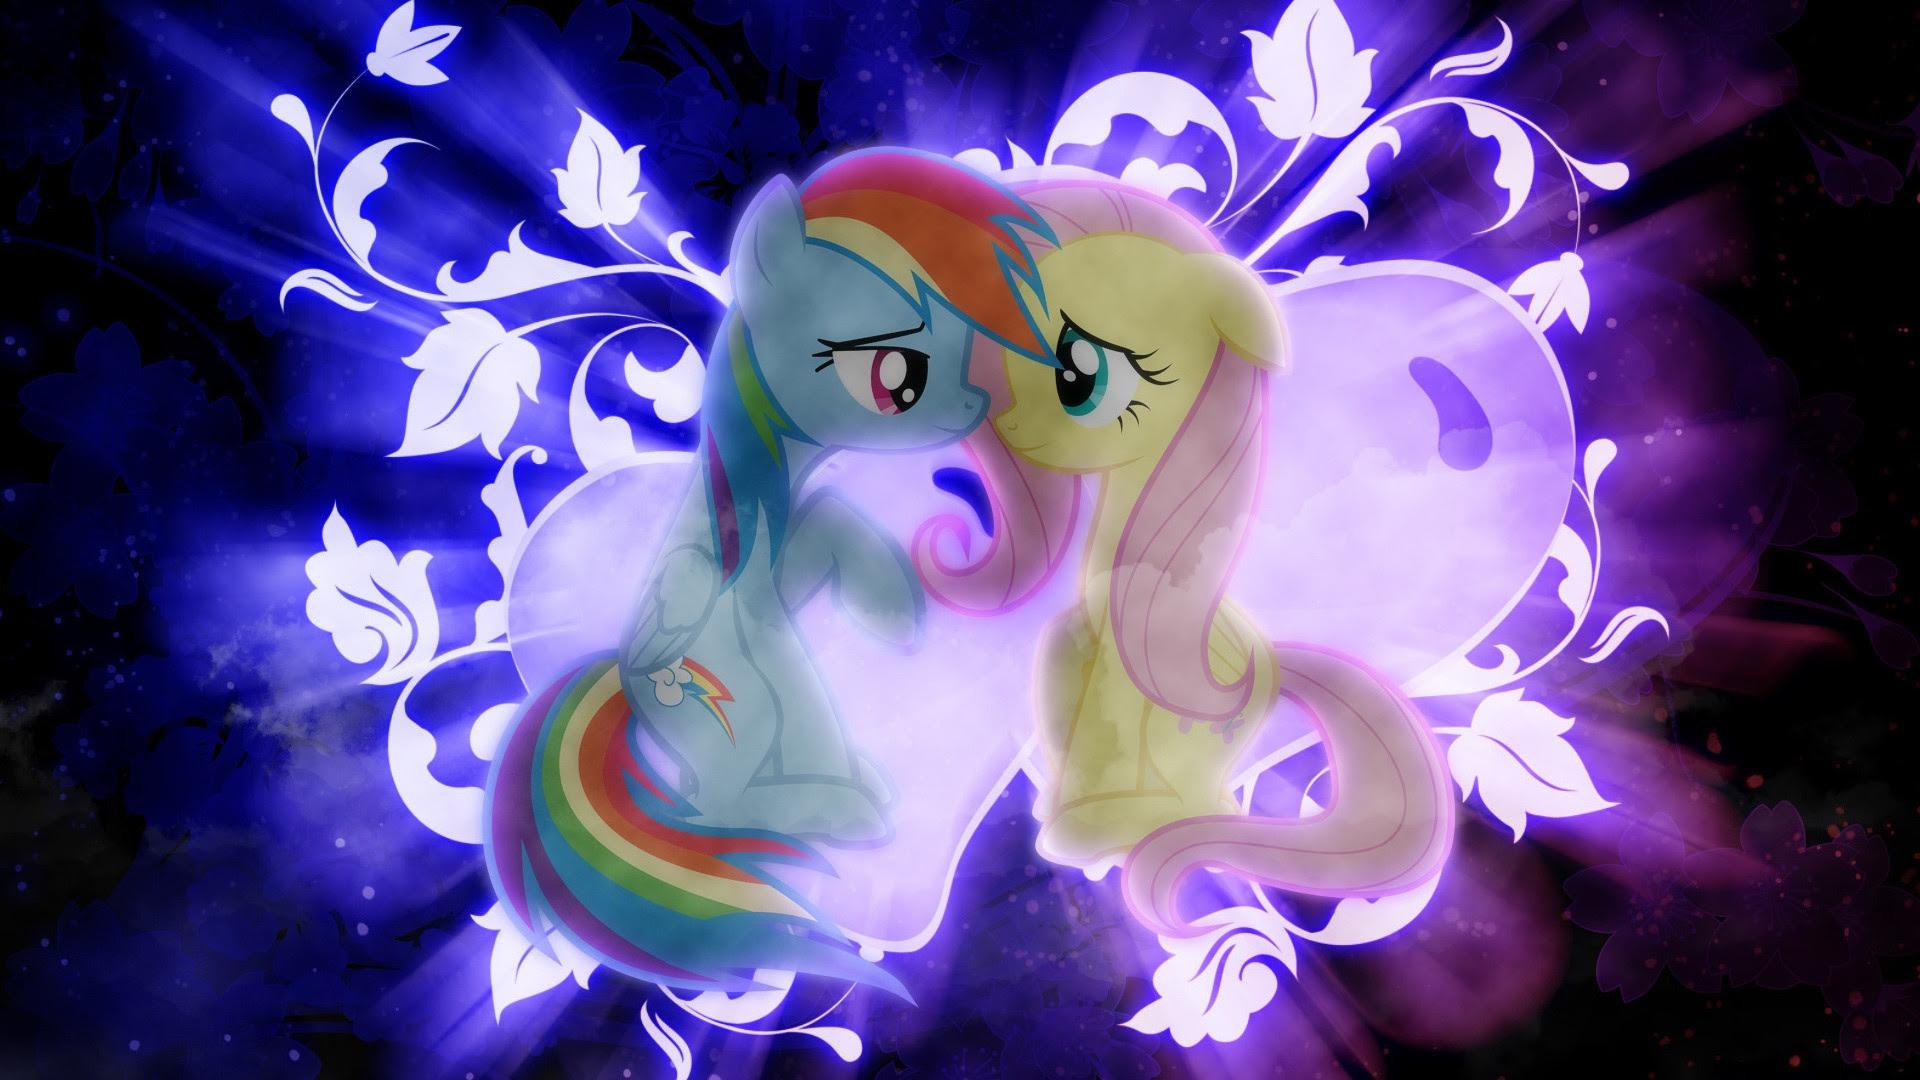 Desktop Rainbow Dash Hd Wallpapers Pixelstalk My Little Pony